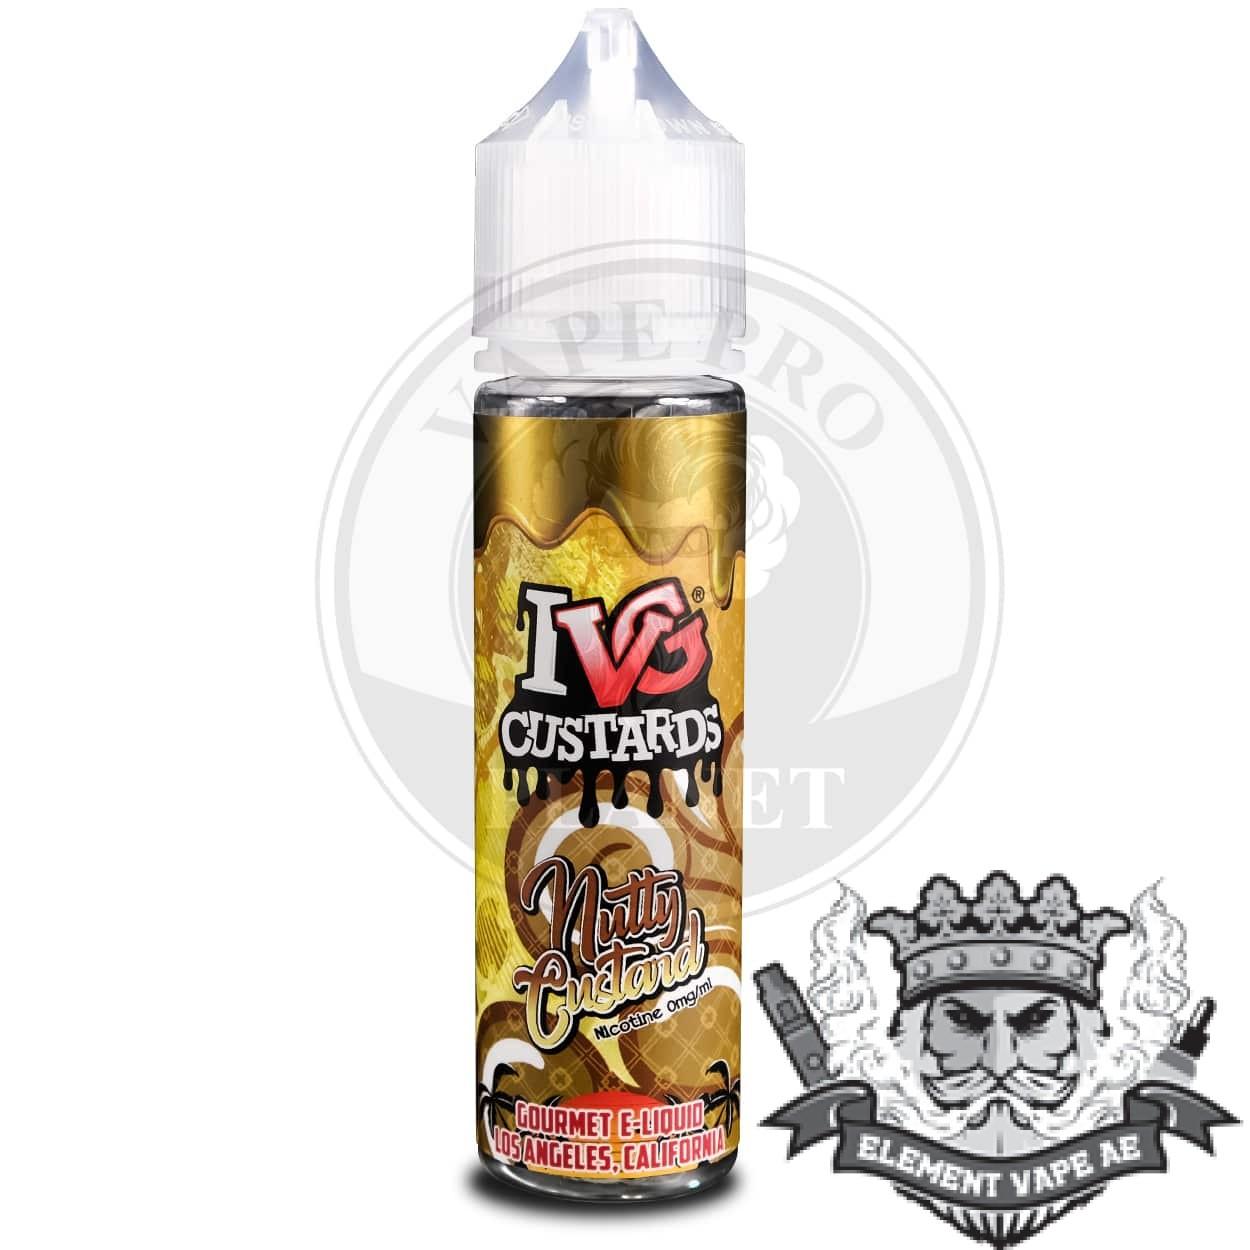 Nutty Custard ivg vapeproplanet 2